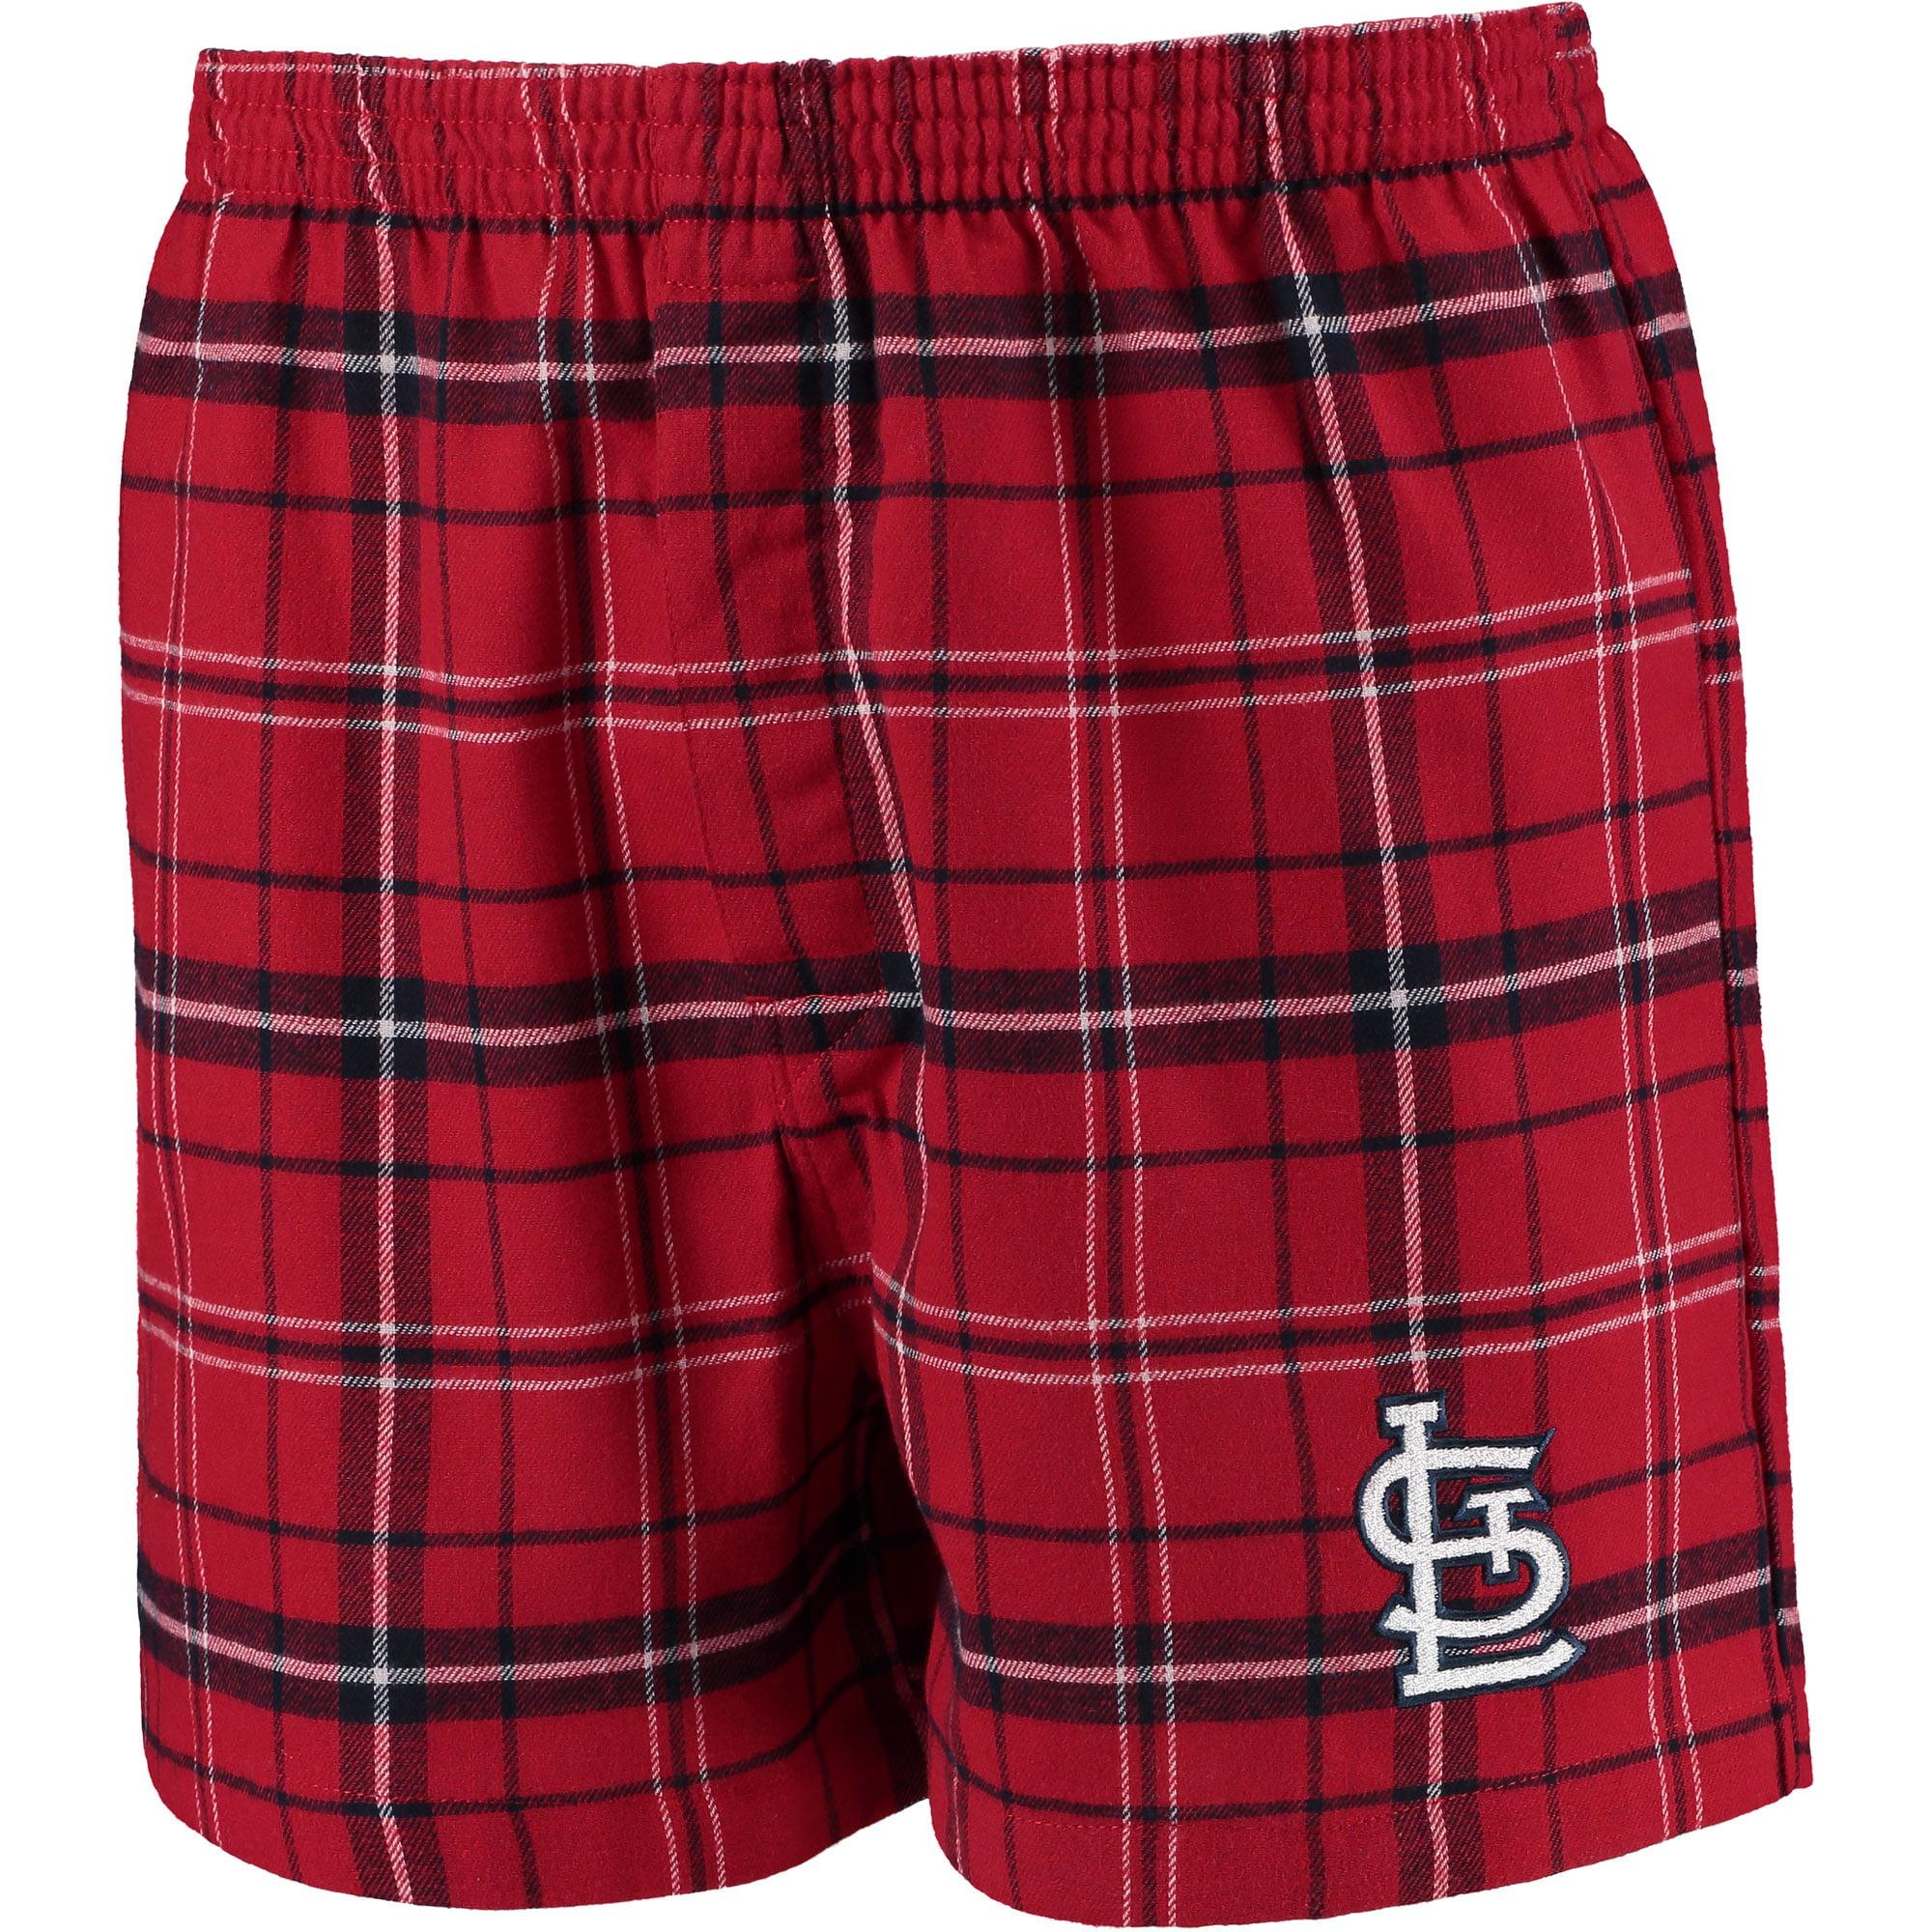 Men's Concepts Sport Red/Navy St. Louis Cardinals Ultimate Flannel Boxer Shorts